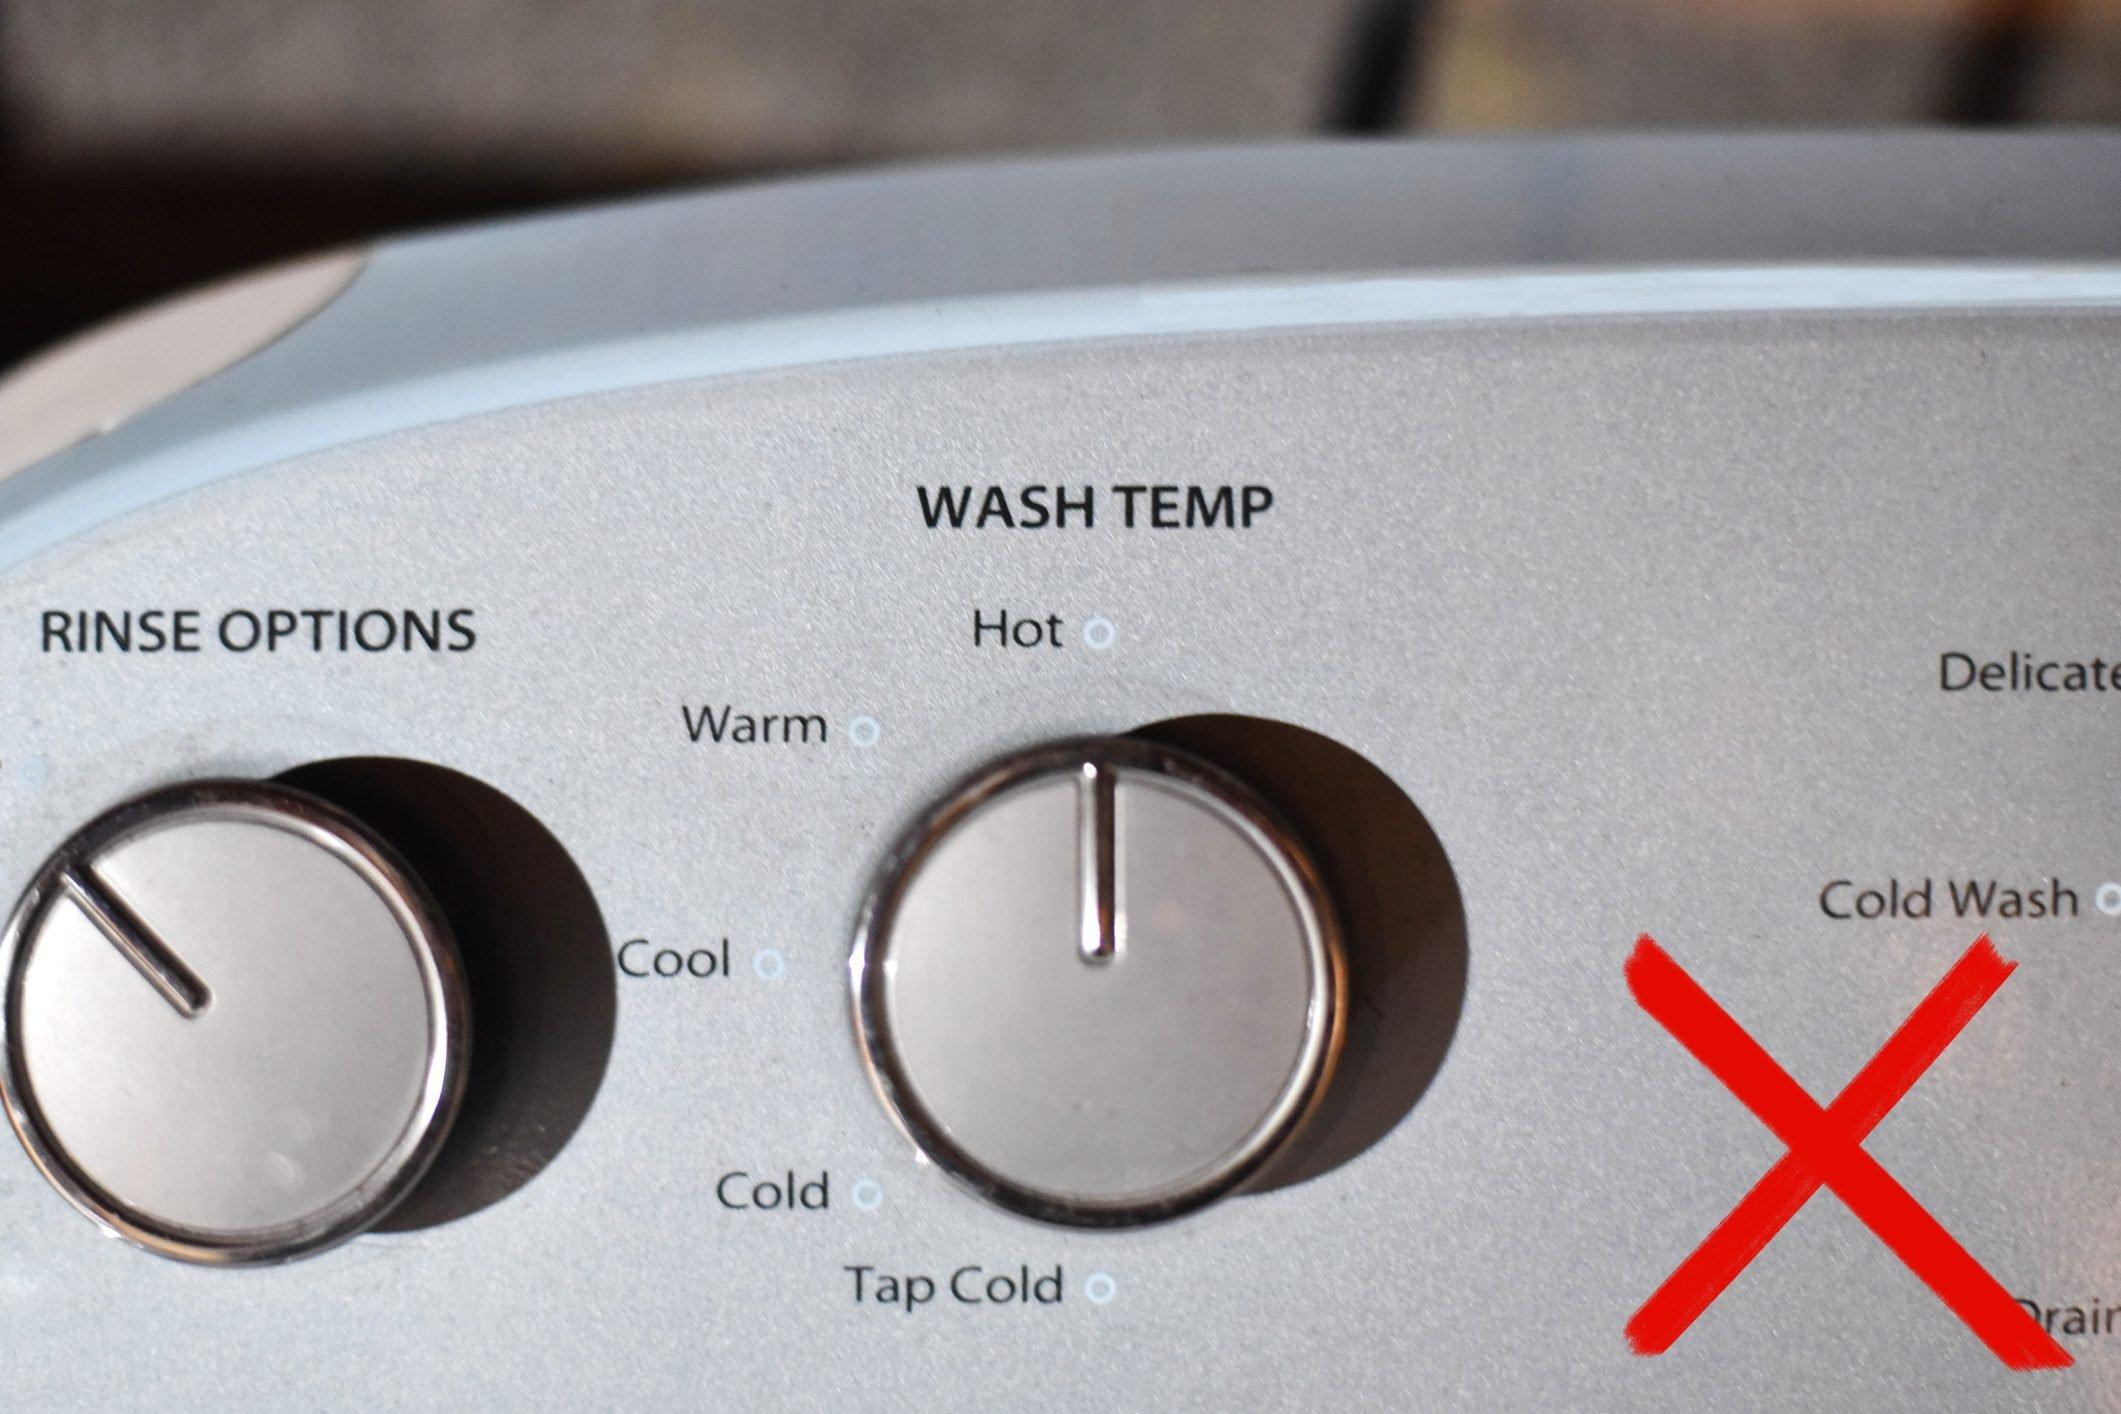 water temperature knob on laundry machine